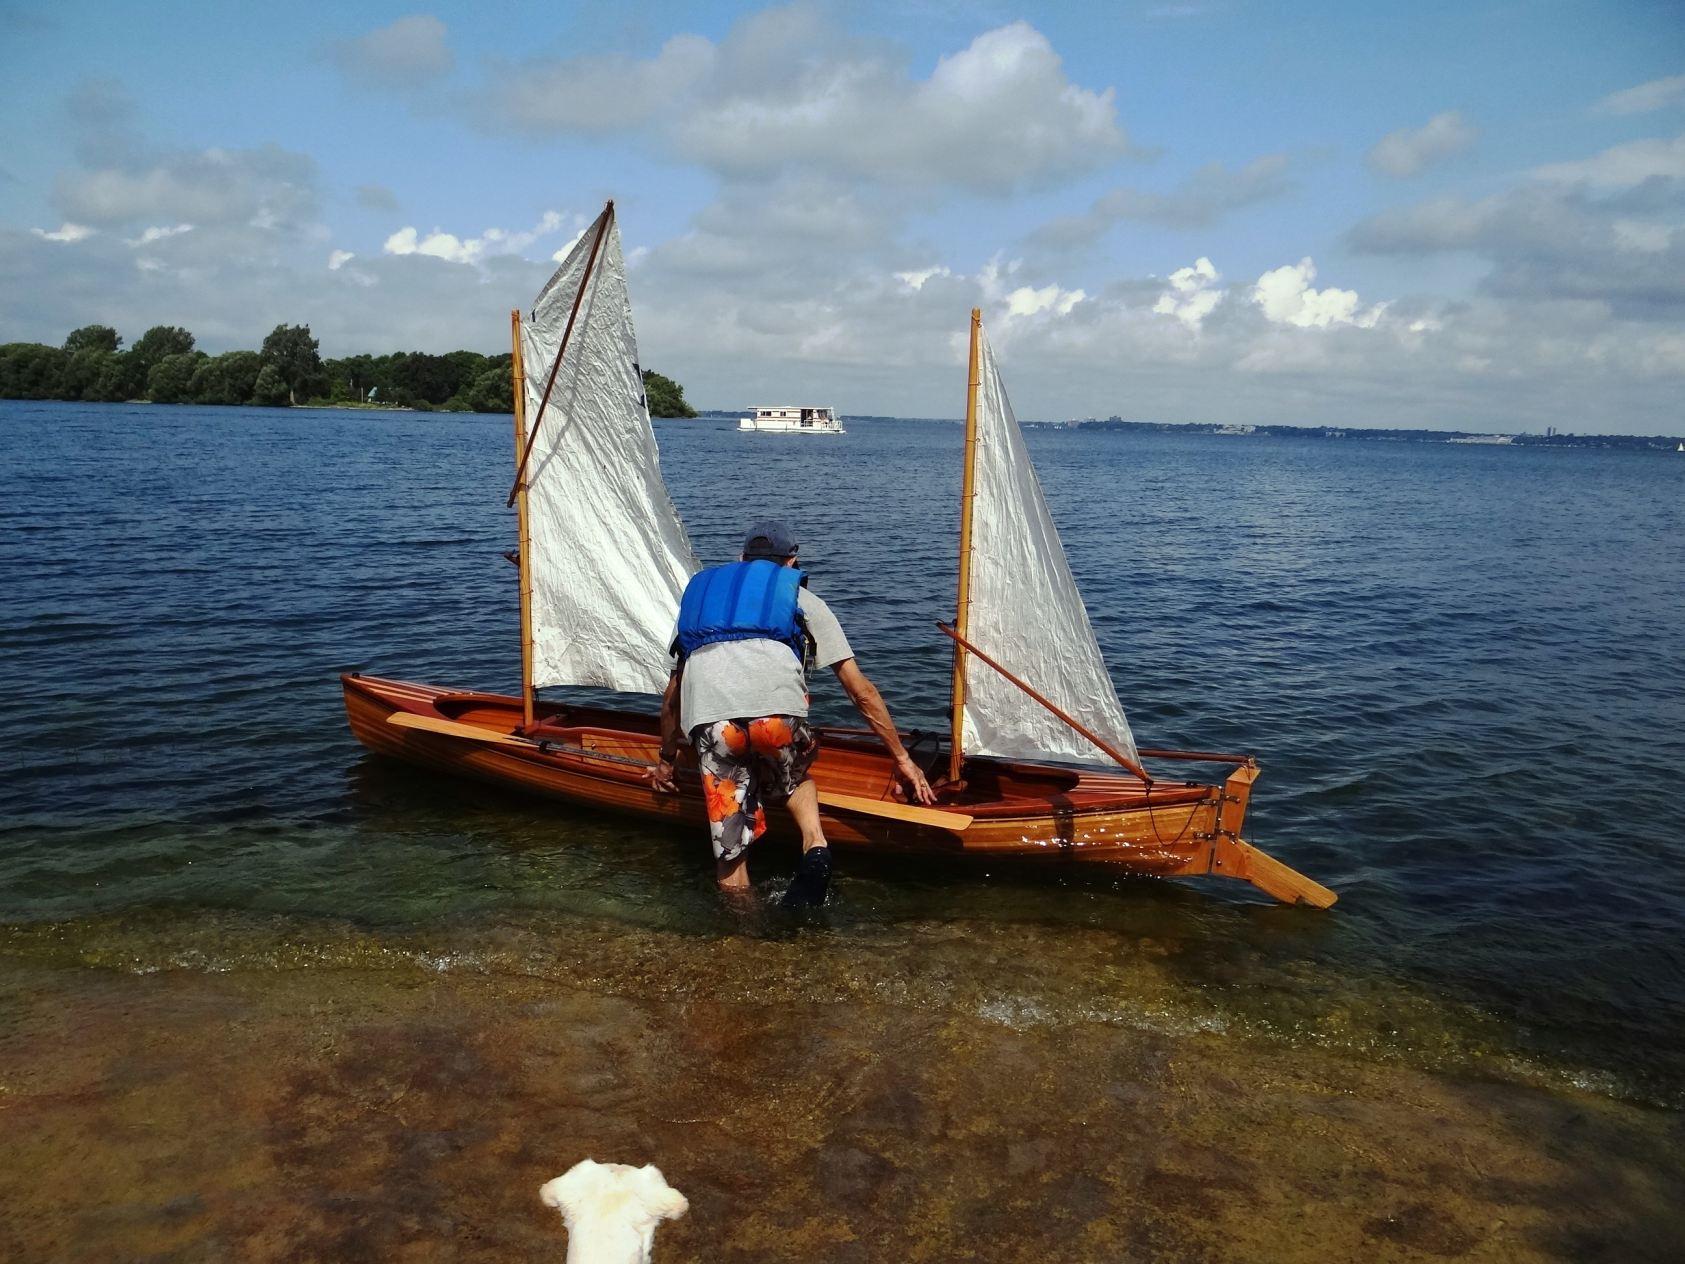 2012: Steve's sailing canoe